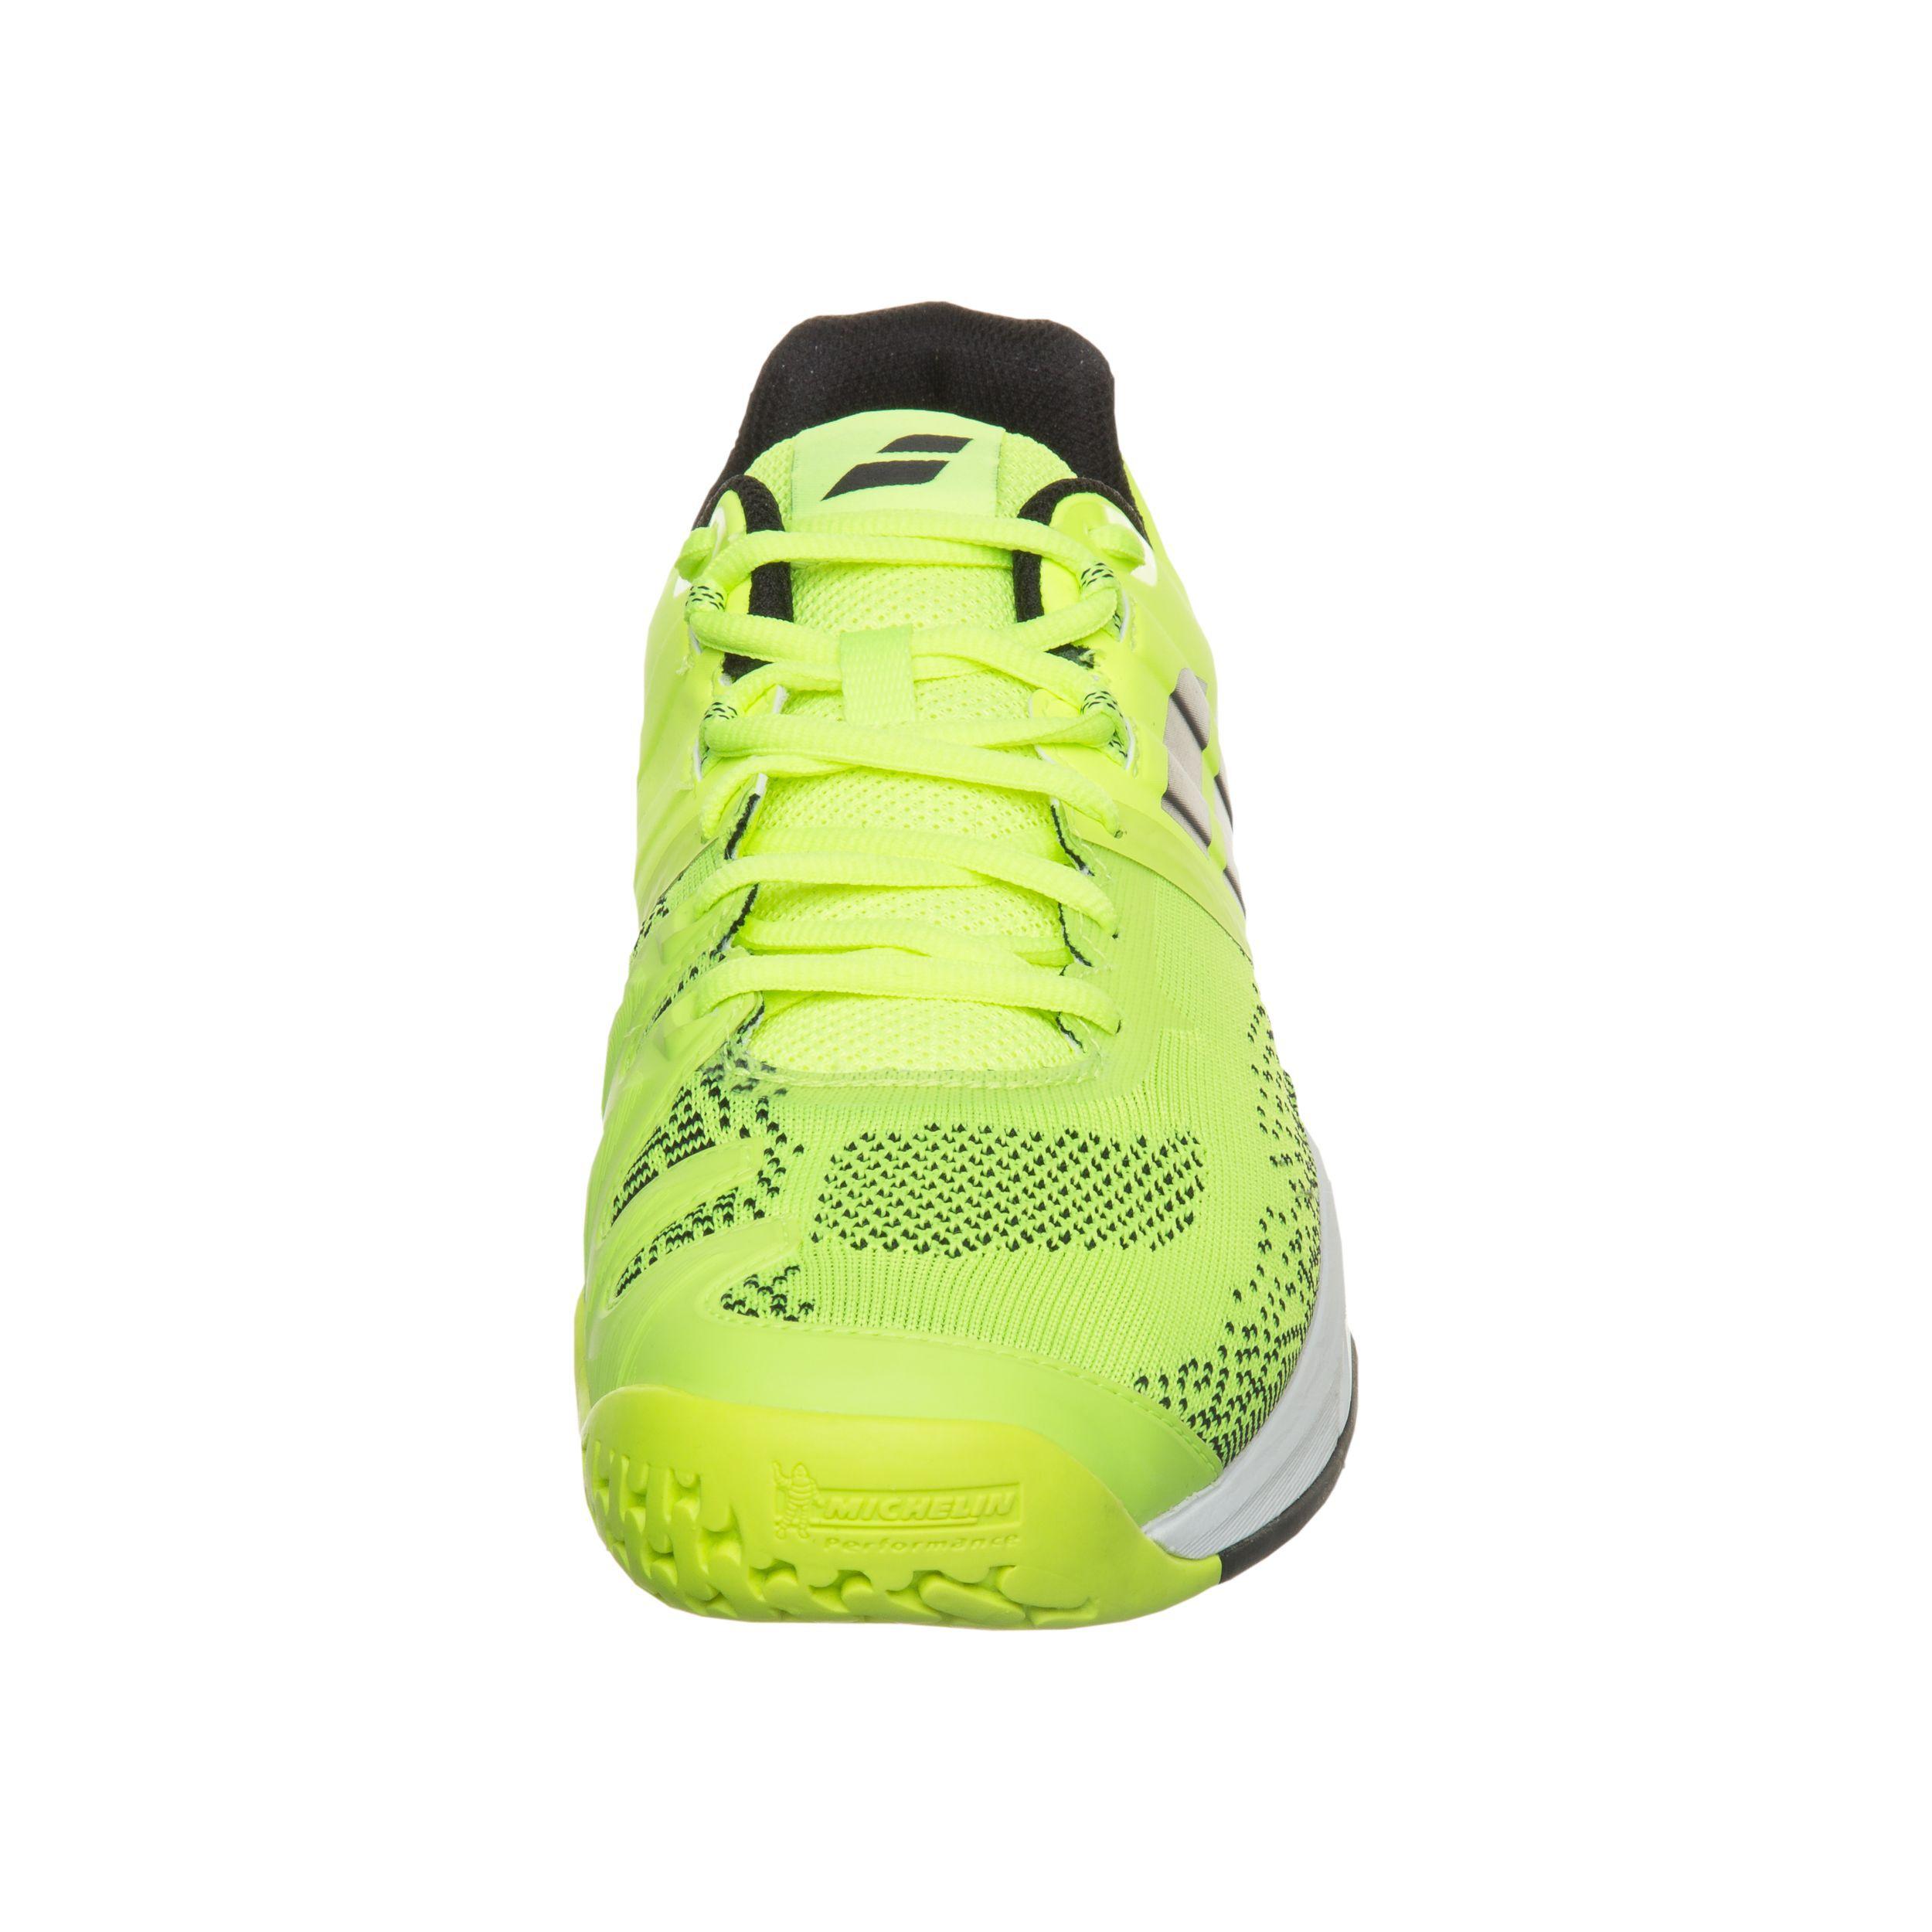 Chaussure Babolat Propulse Blast Jaune : Achat chaussure de